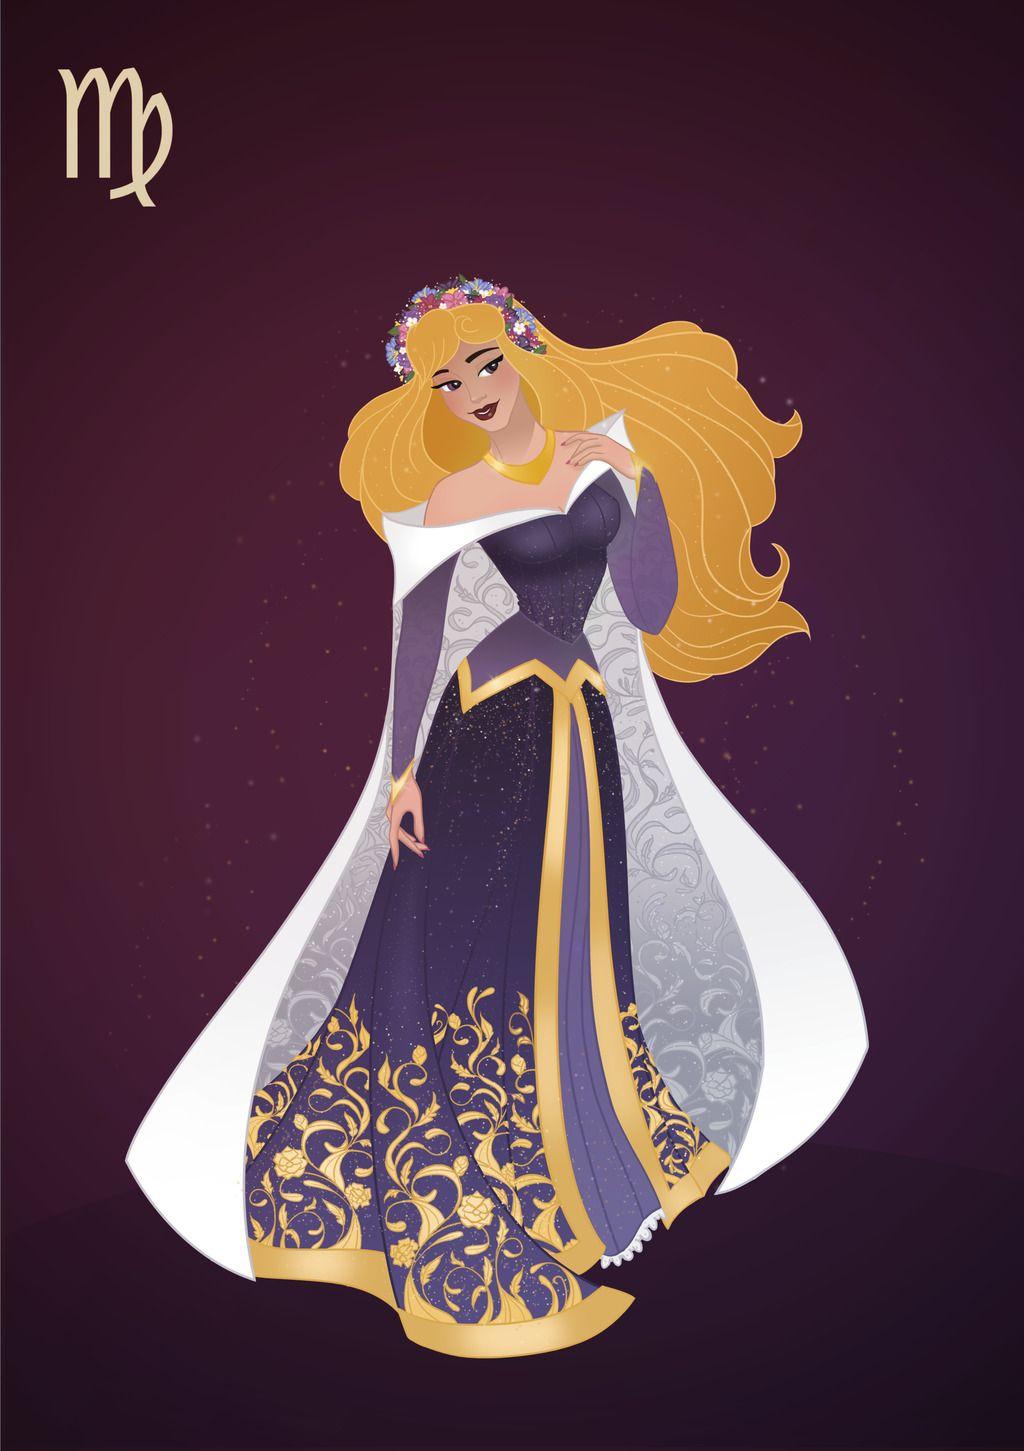 Lucy Corsetry (Bishonenrancher) — princessesfanarts: Zodiac Princesses...